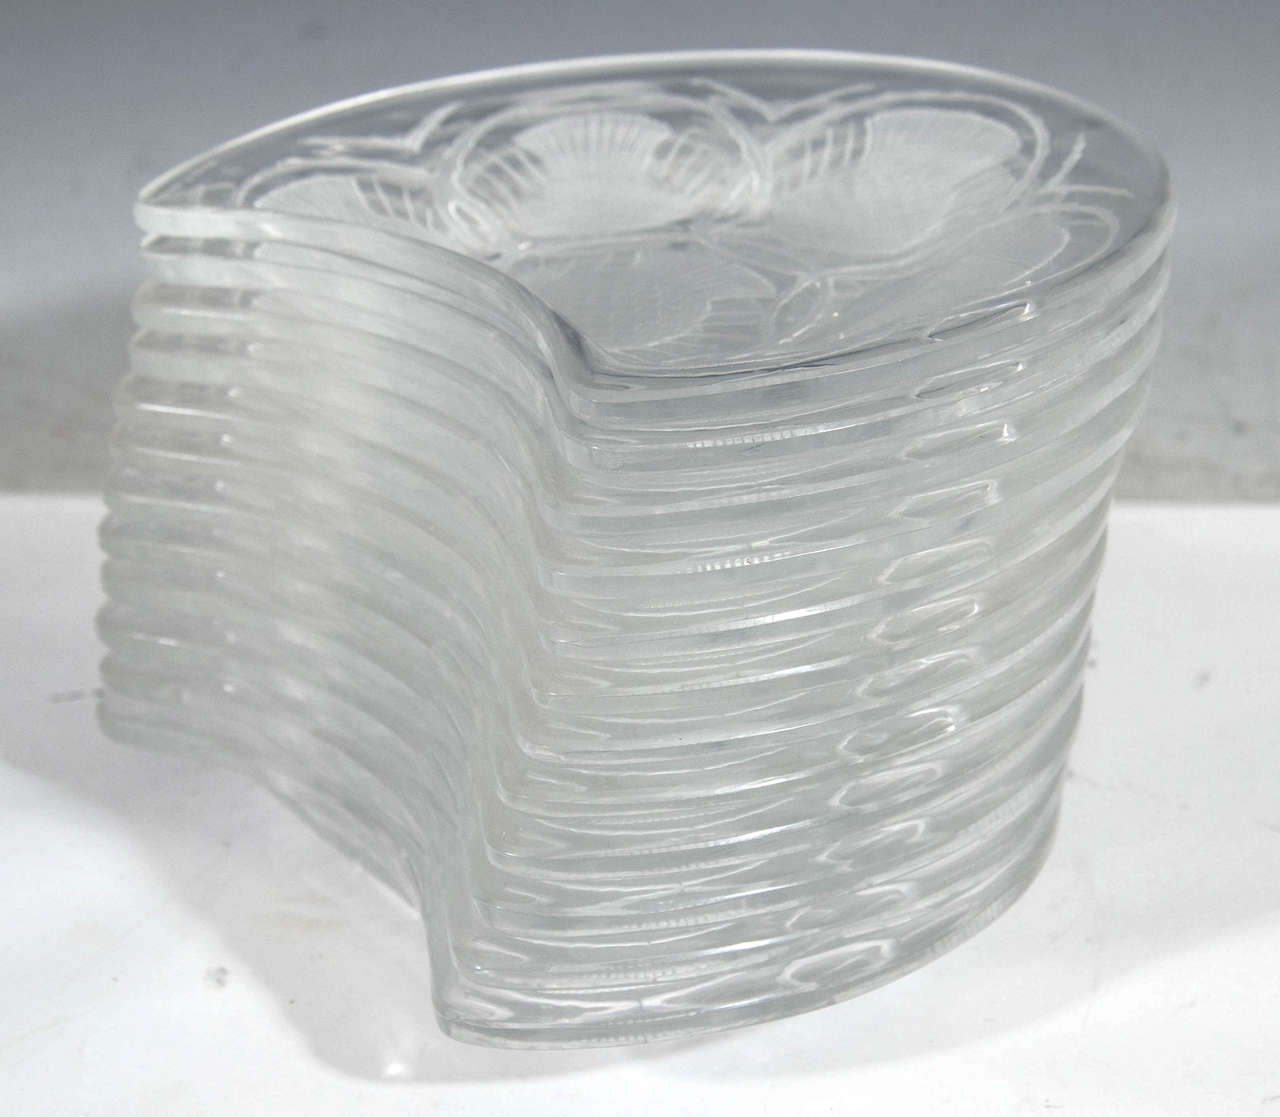 Vintage Set of 12 Lalique Crystal Chardon Thistle Dessert Plates 4